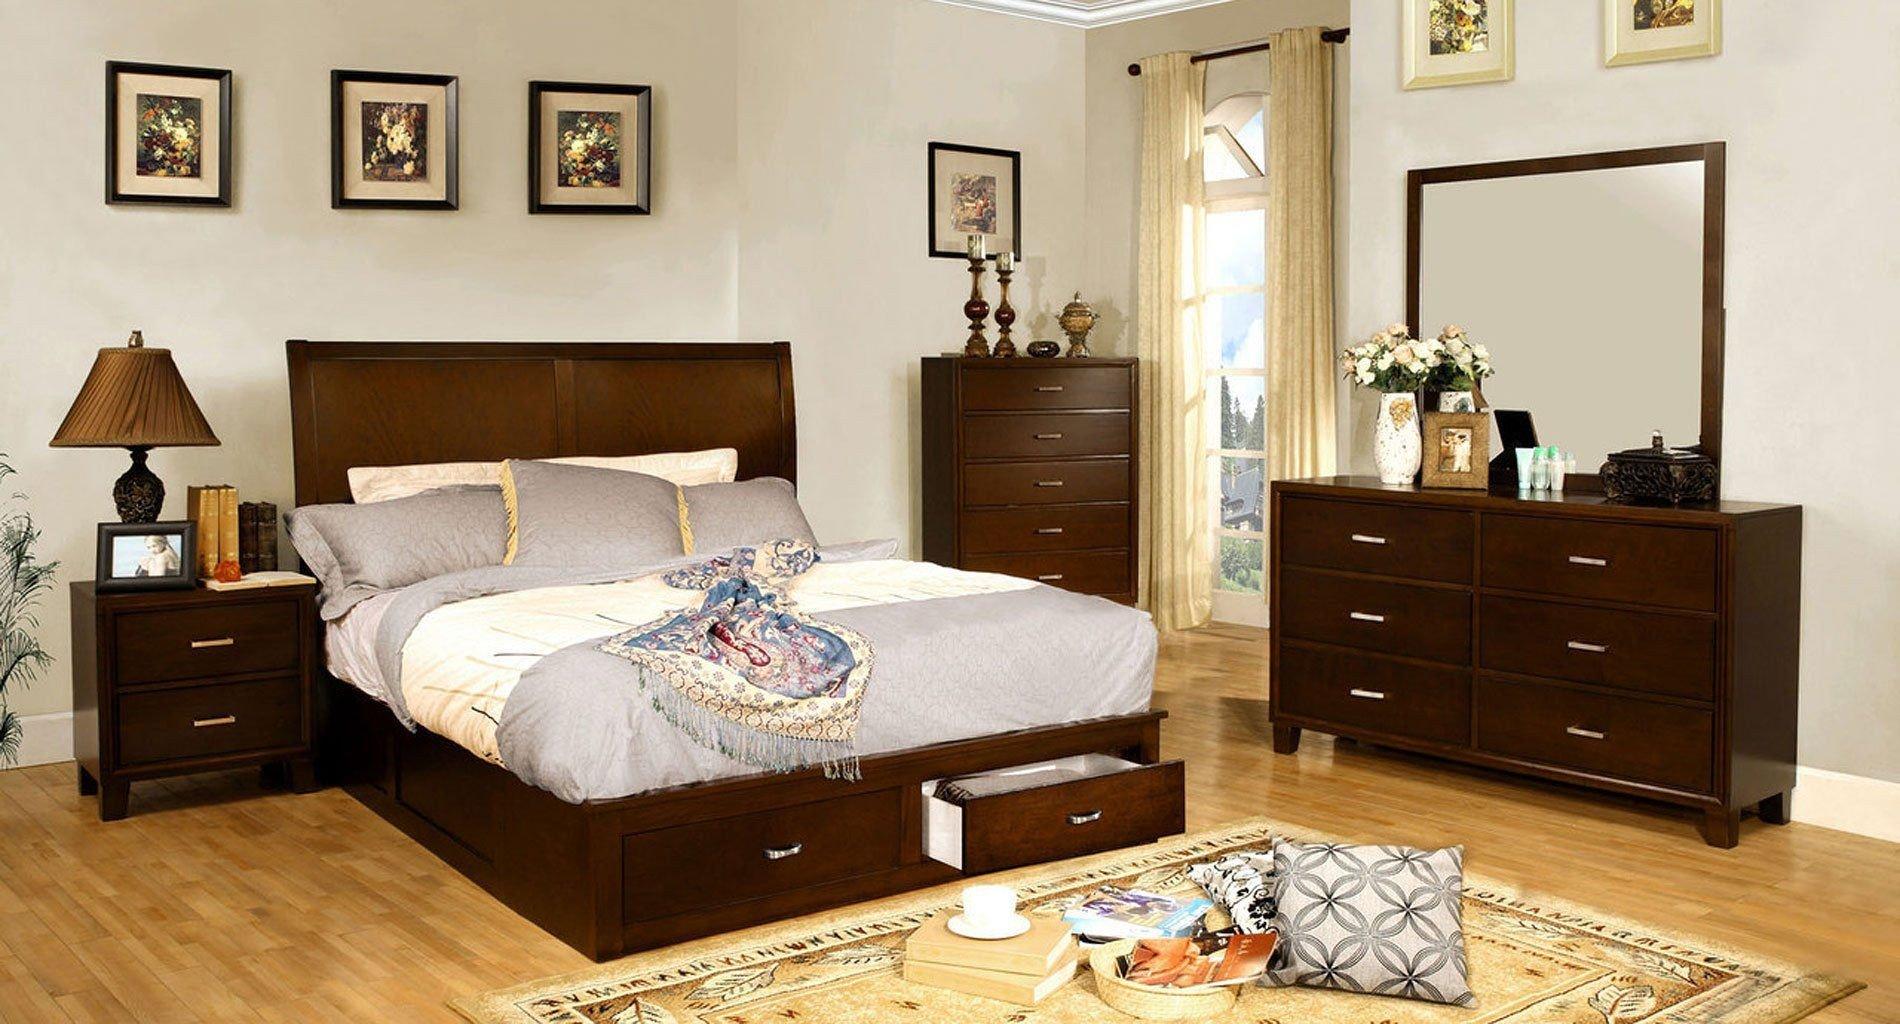 Bedroom Set with Storage Inspirational Enrico Storage Platform Bedroom Set Brown Cherry